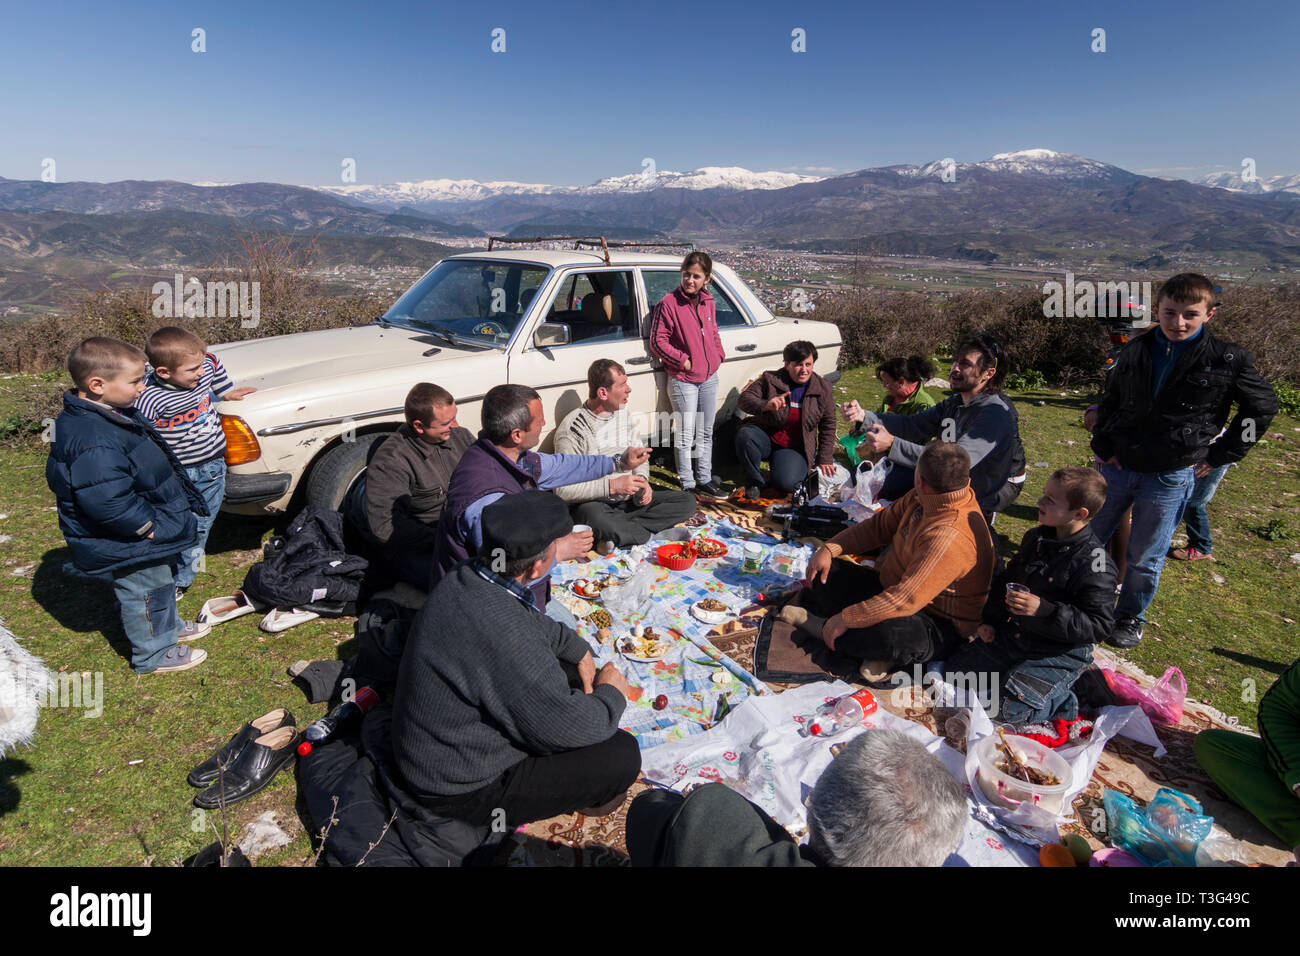 Elbasan, Albania : Albanian family picnicking celebrating Diten E Veres Spring Day festival (March 14th) - Stock Image